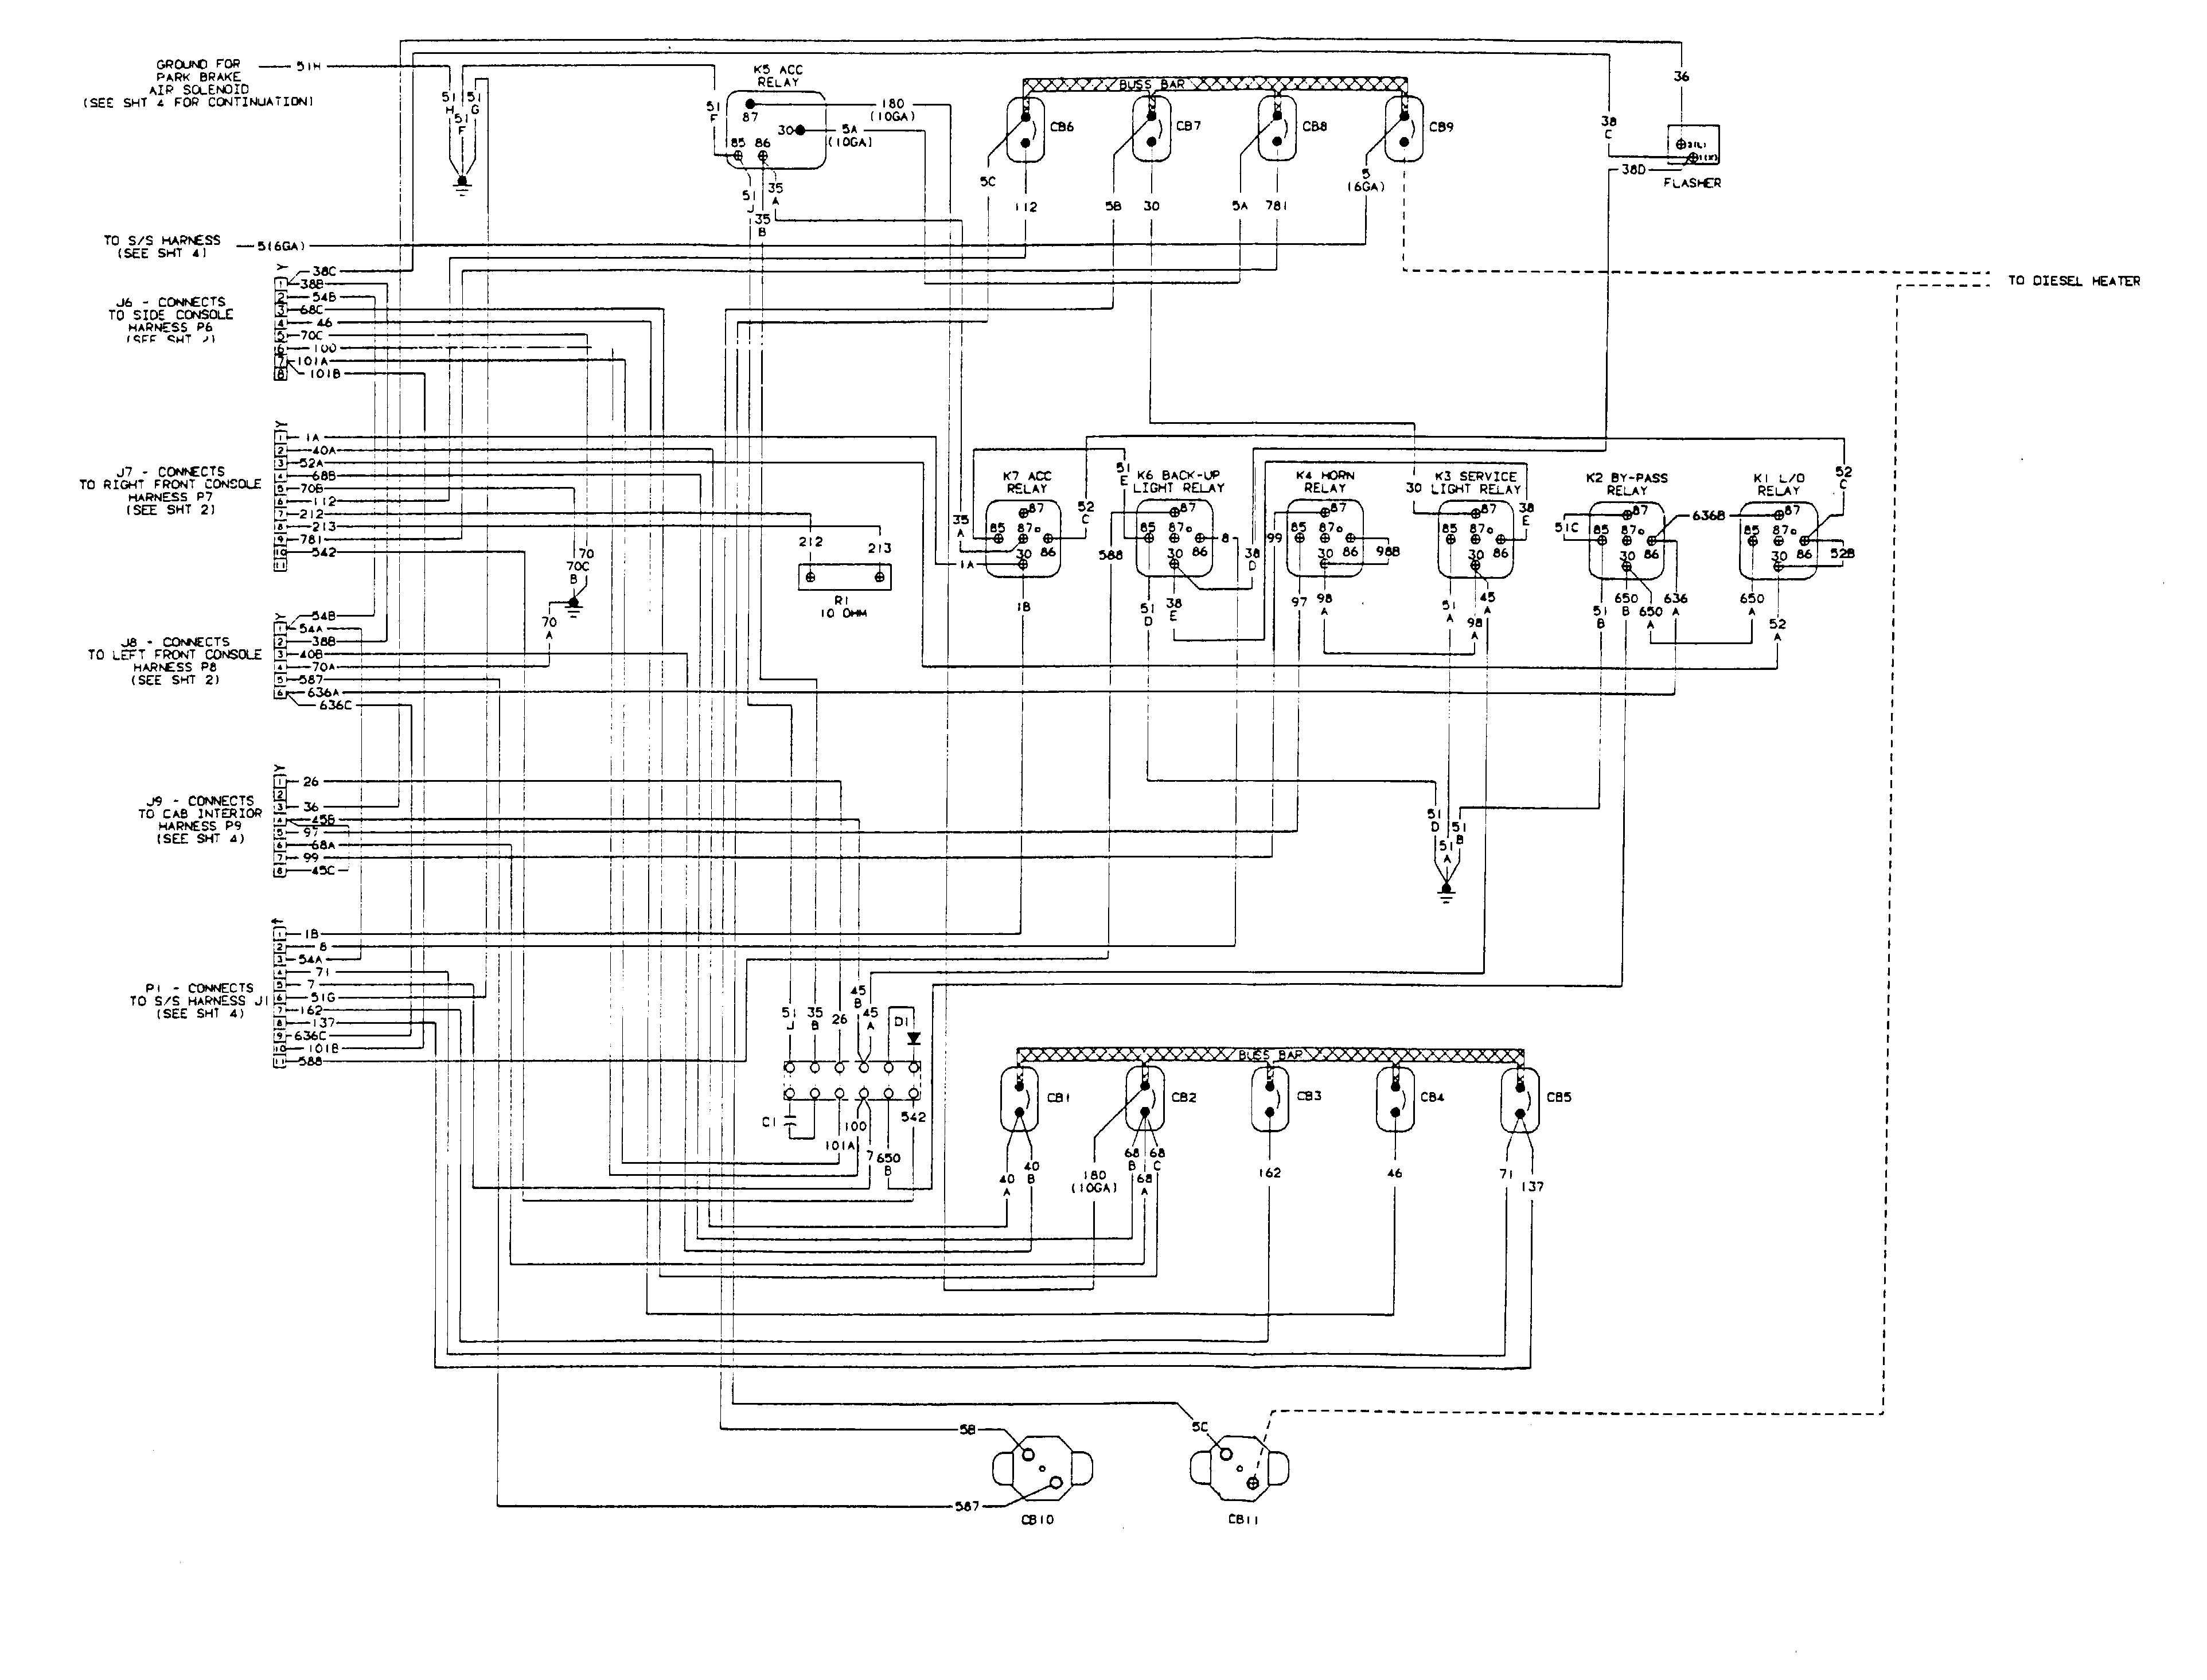 [DHAV_9290]  SM_3646] Demag Wiring Diagram Download Diagram   Overhead Crane Electrical Wiring Diagram      Teria Xaem Ical Licuk Carn Rious Sand Lukep Oxyt Rmine Shopa Mohammedshrine  Librar Wiring 101